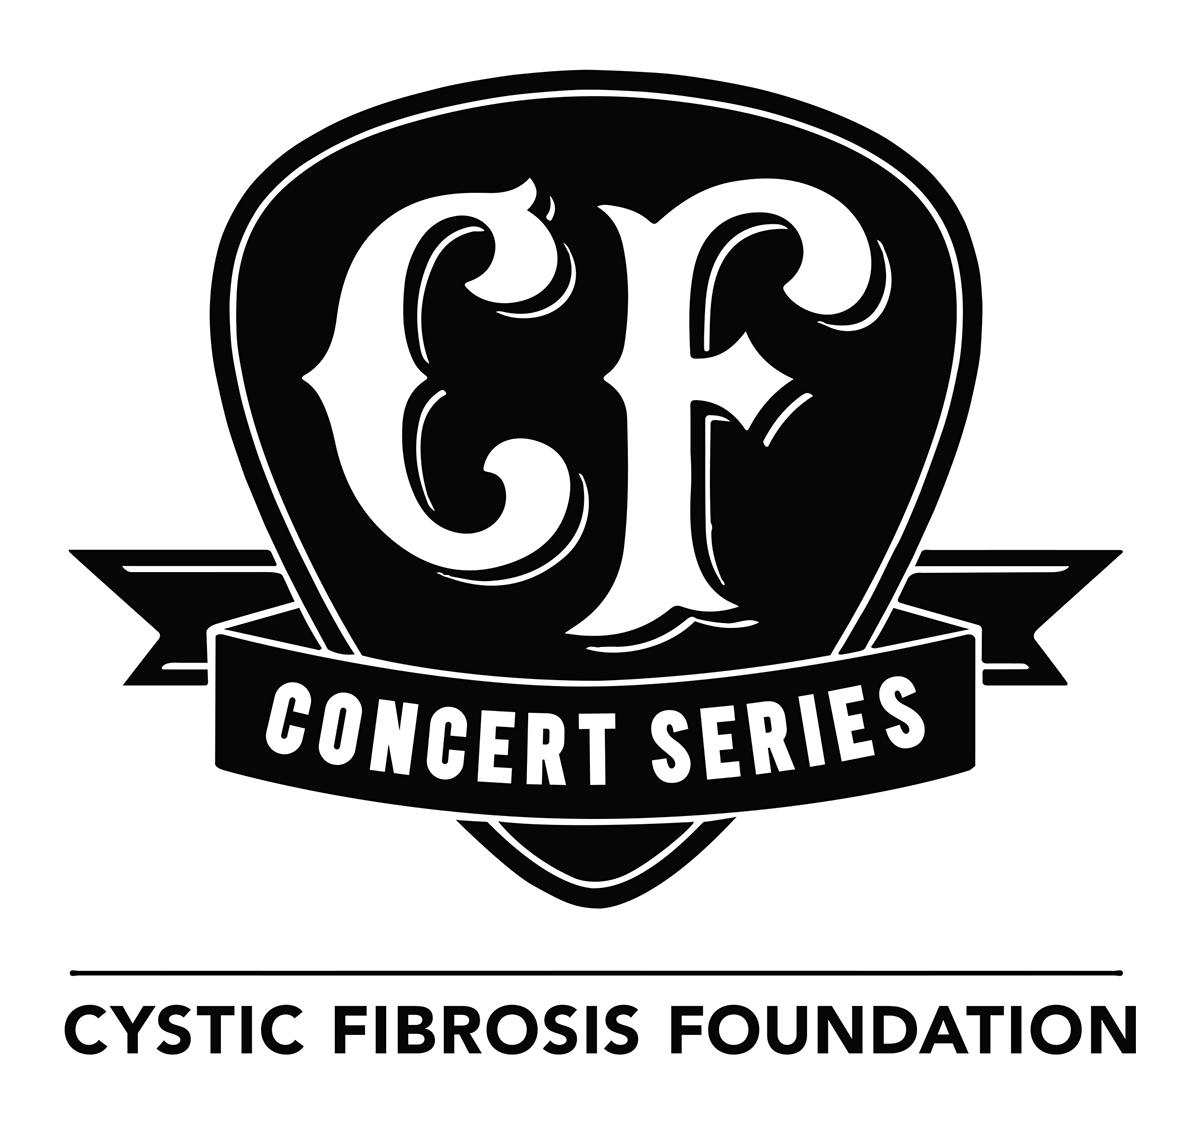 9th Annual Cf Concert Series On Behance